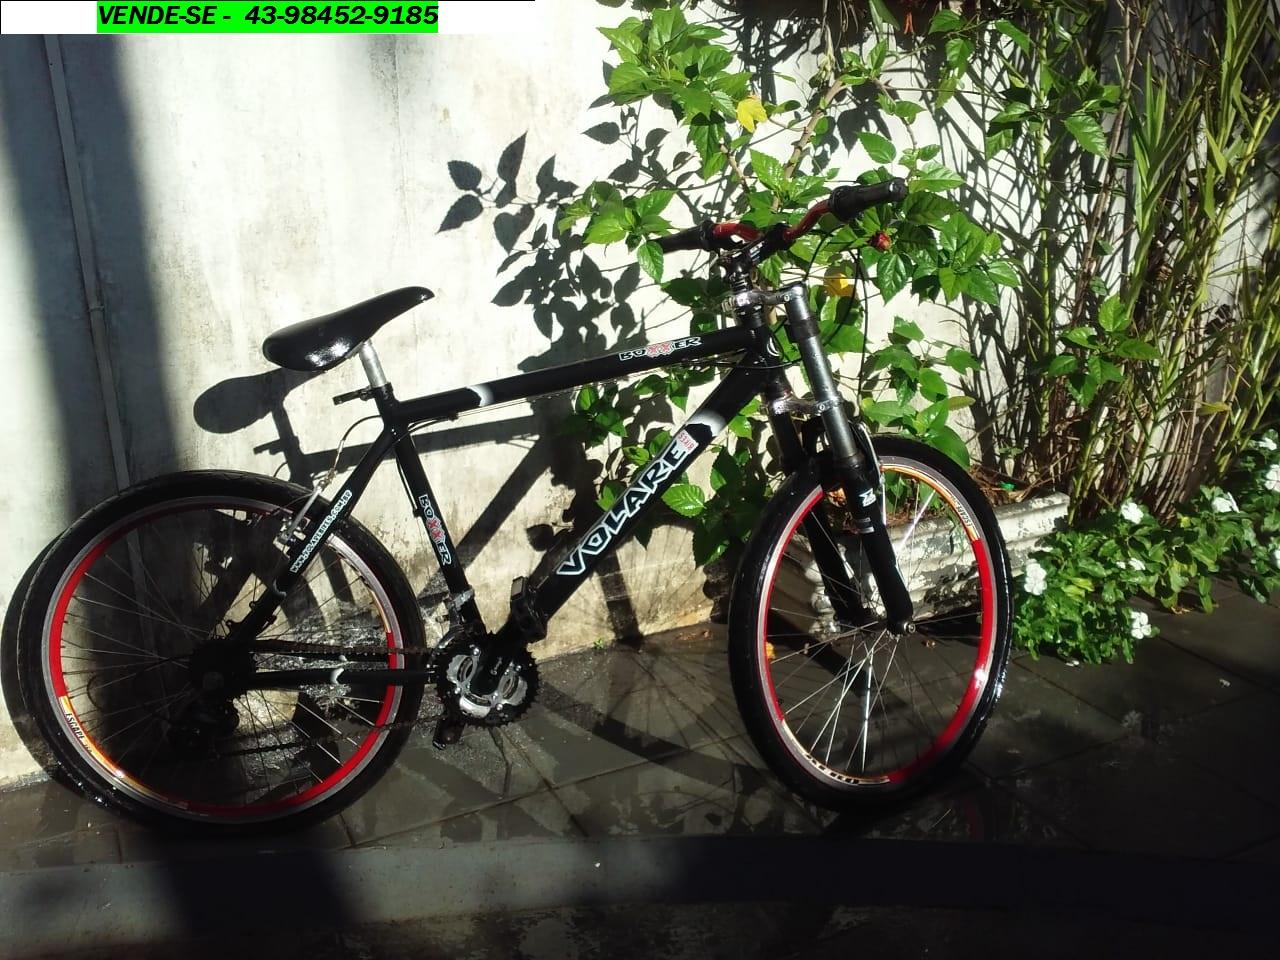 Londrina-Vende bicicletas